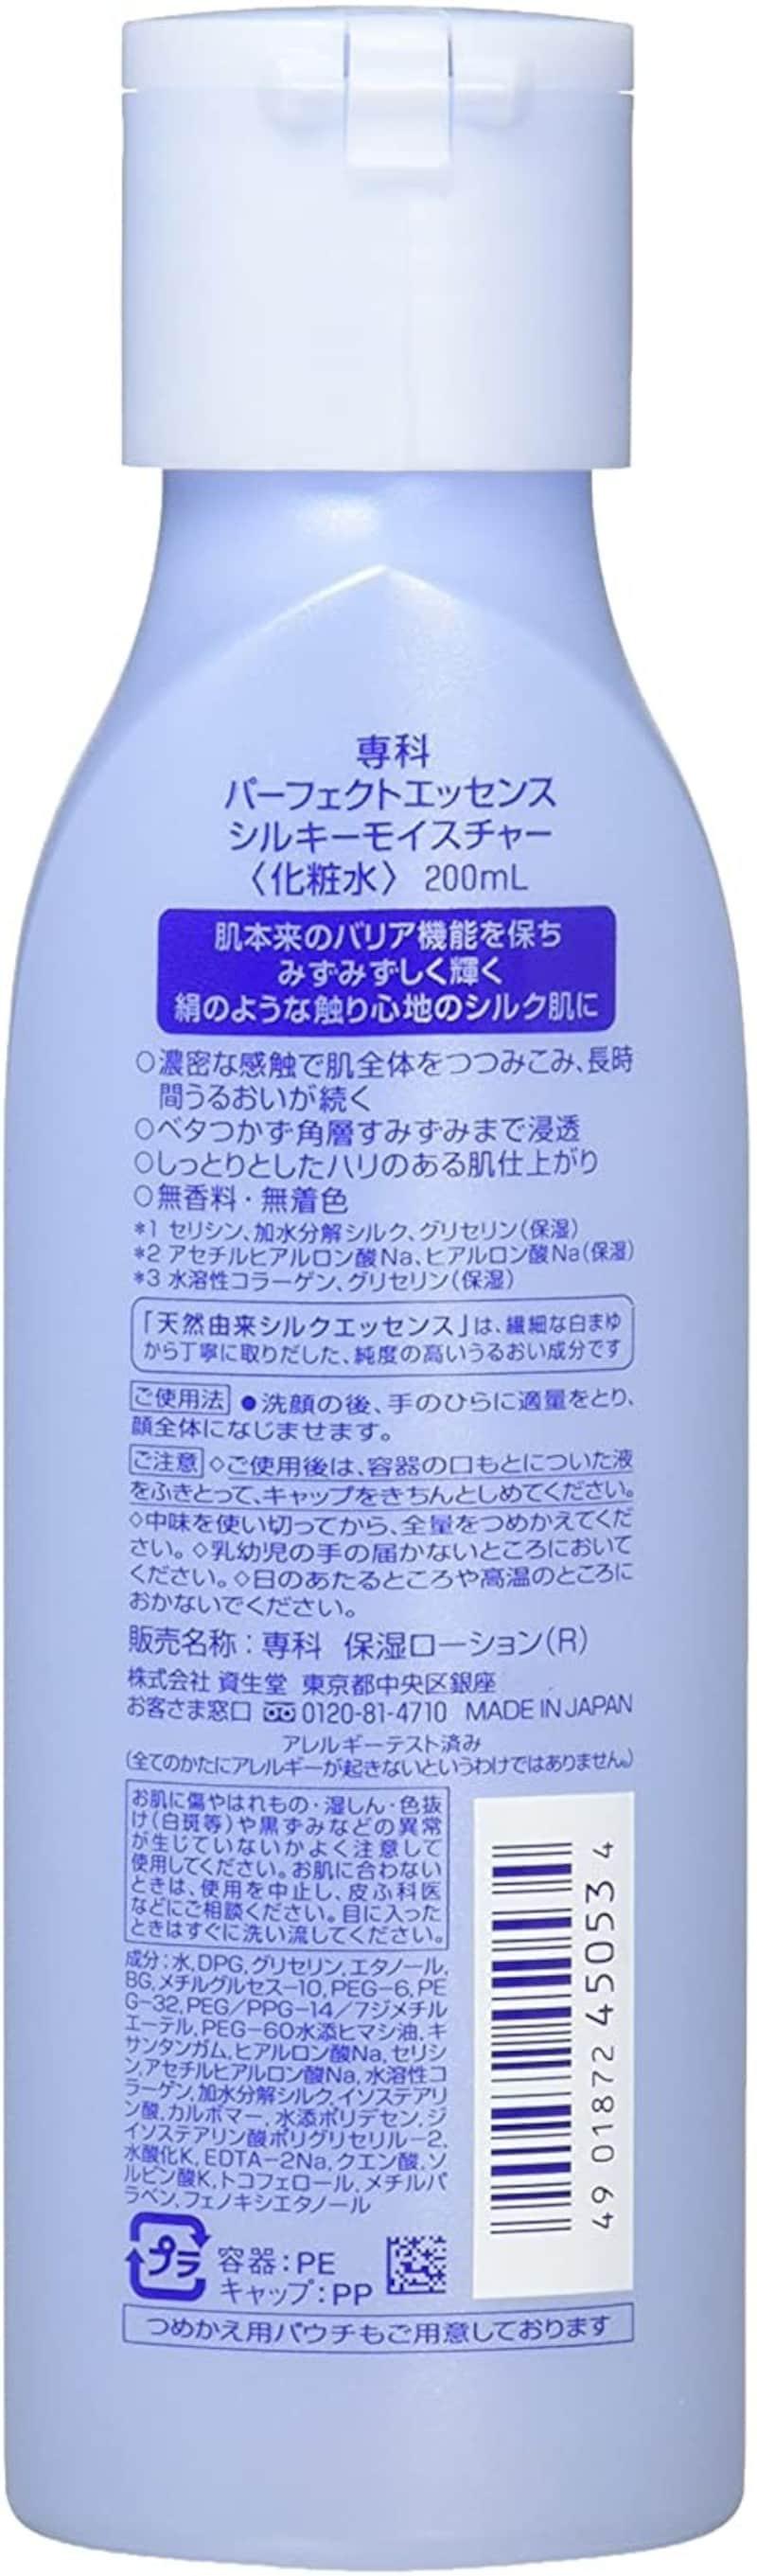 SHISEIDO(資生堂), 専科 パーフェクトエッセンス シルキーモイスチャー